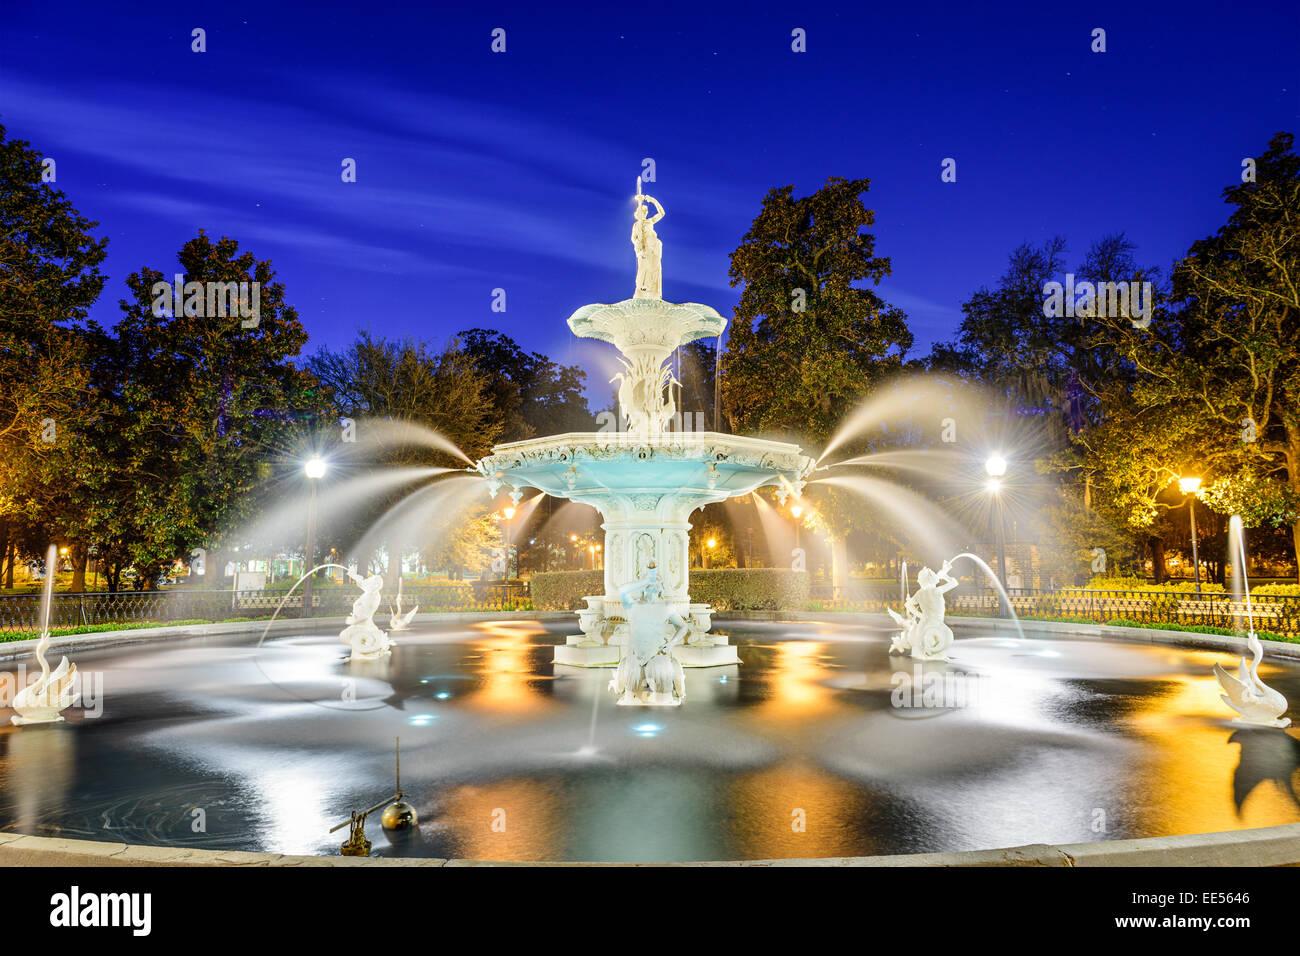 Il Savannah, Georgia, Stati Uniti d'America al Forsyth park fontana. Immagini Stock